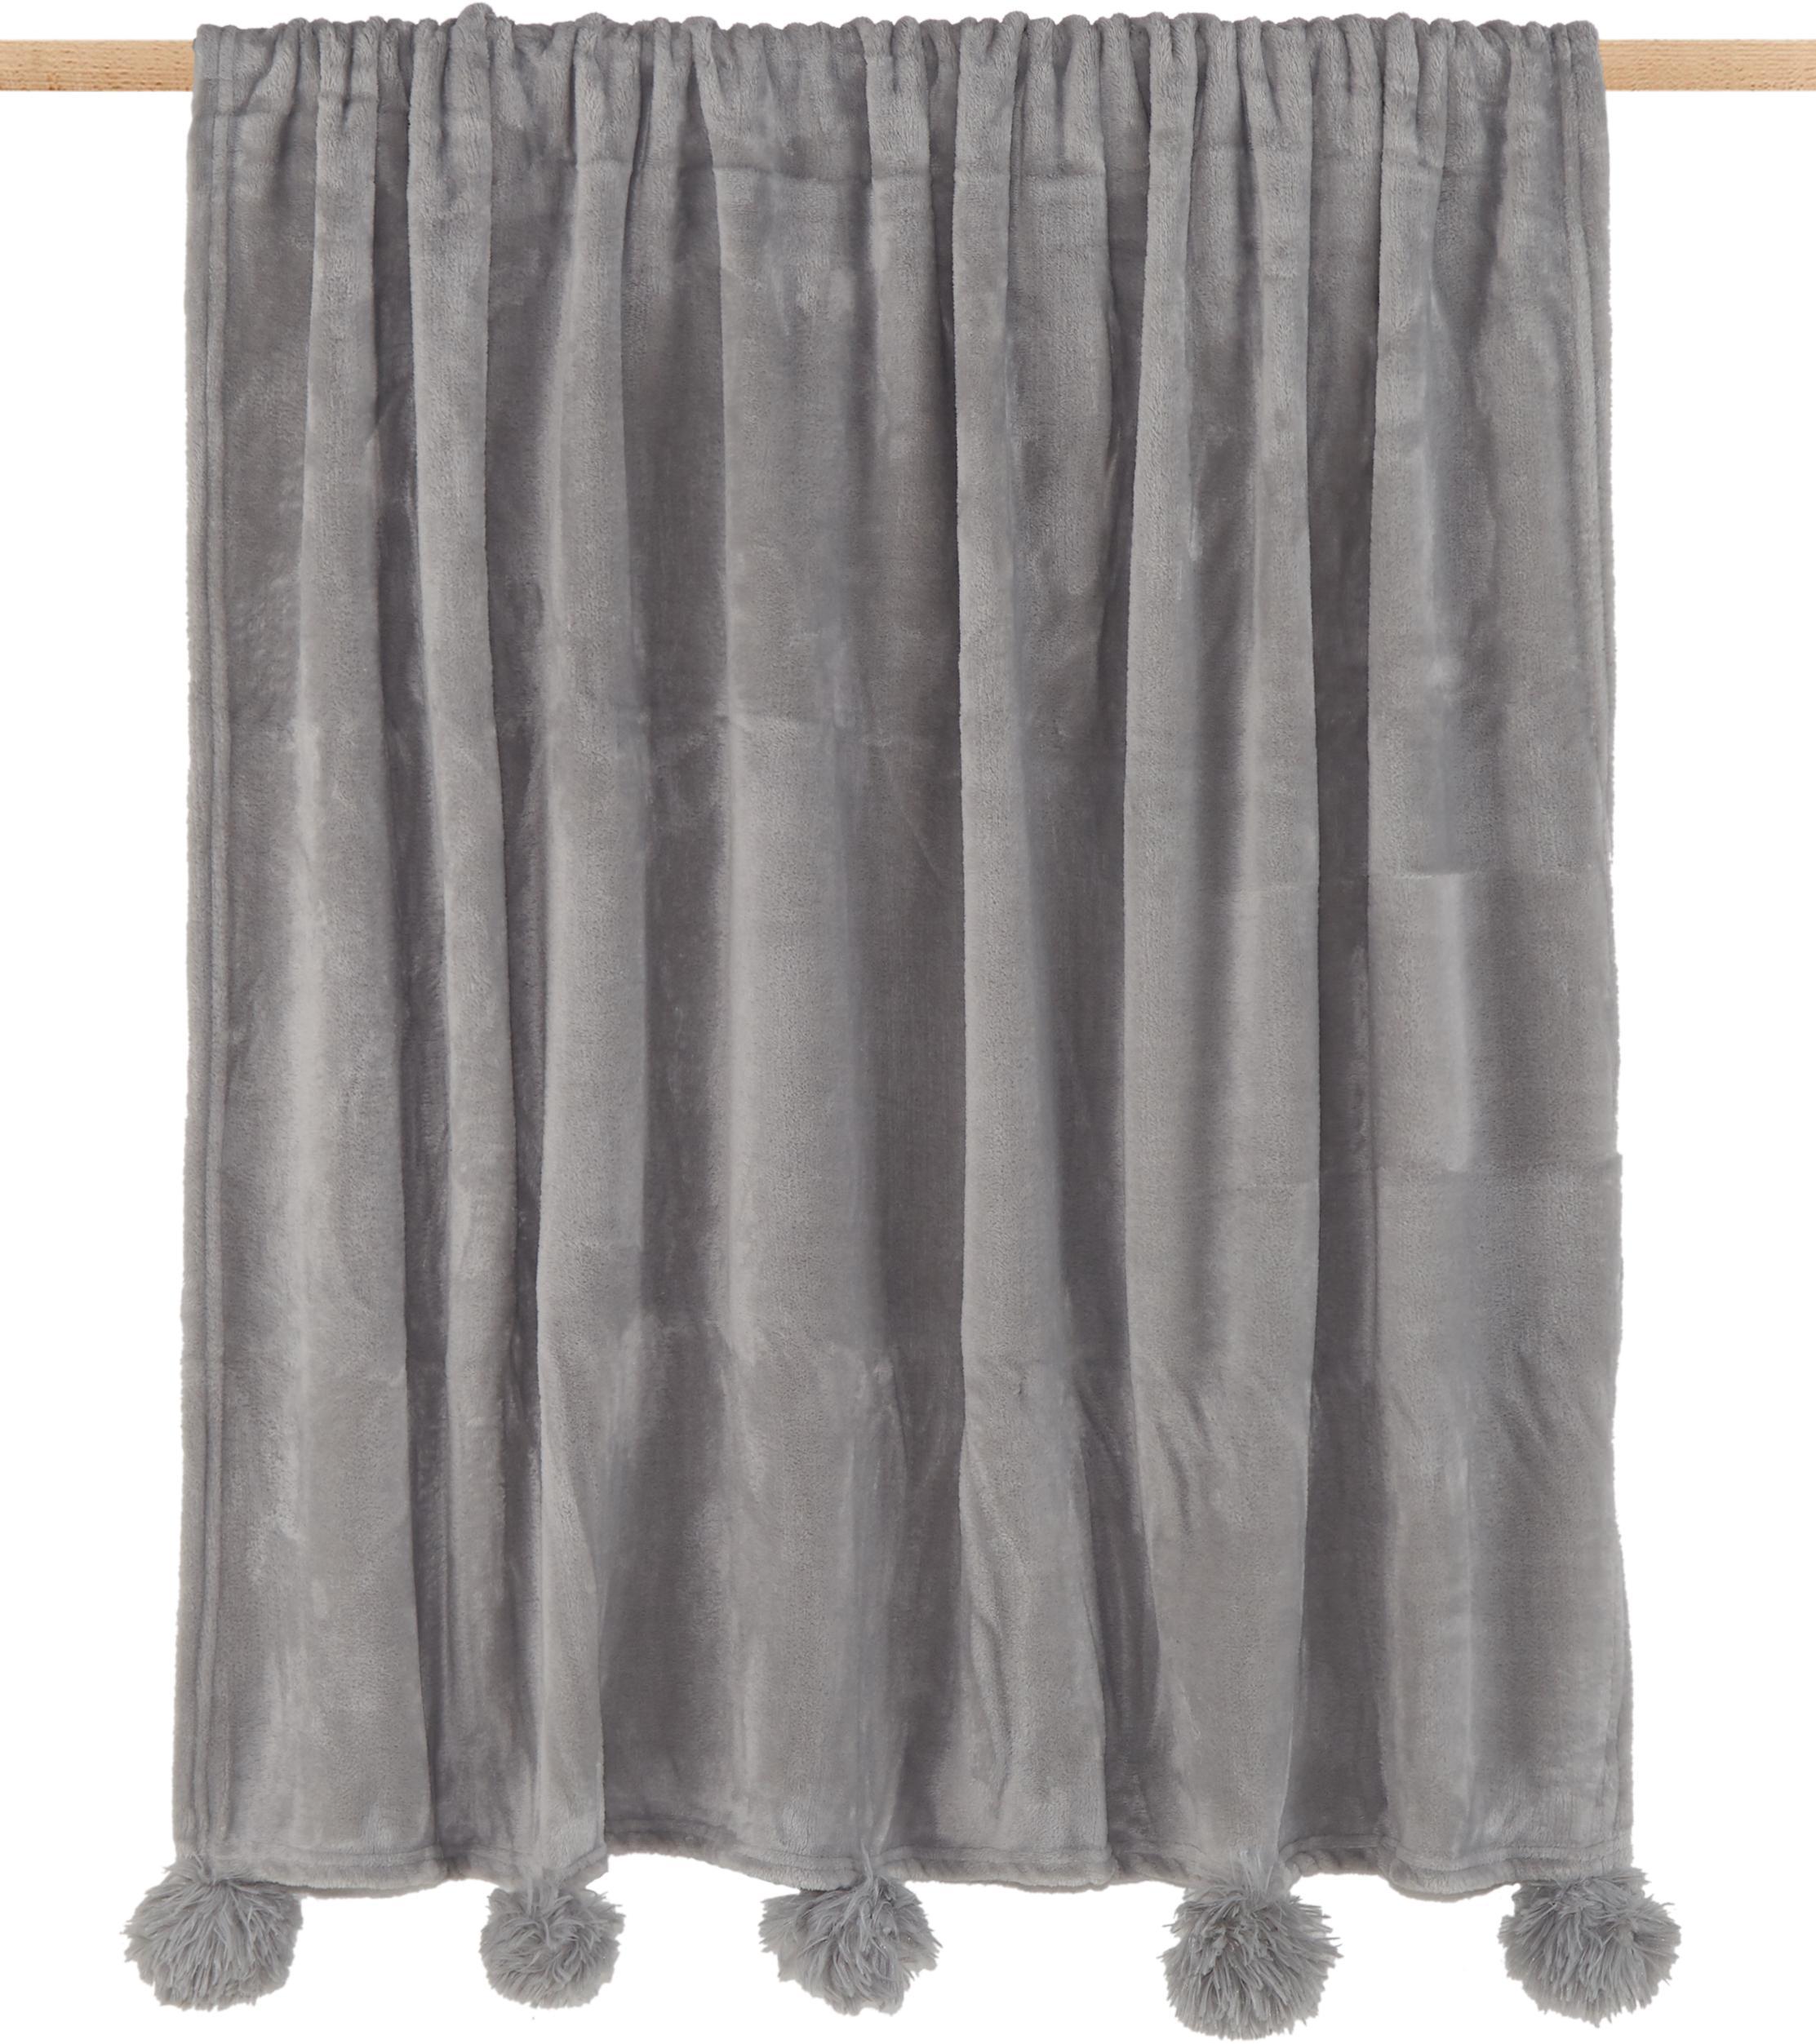 Manta de tela polar Bomla, Poliéster, Gris, An 130 x L 170 cm